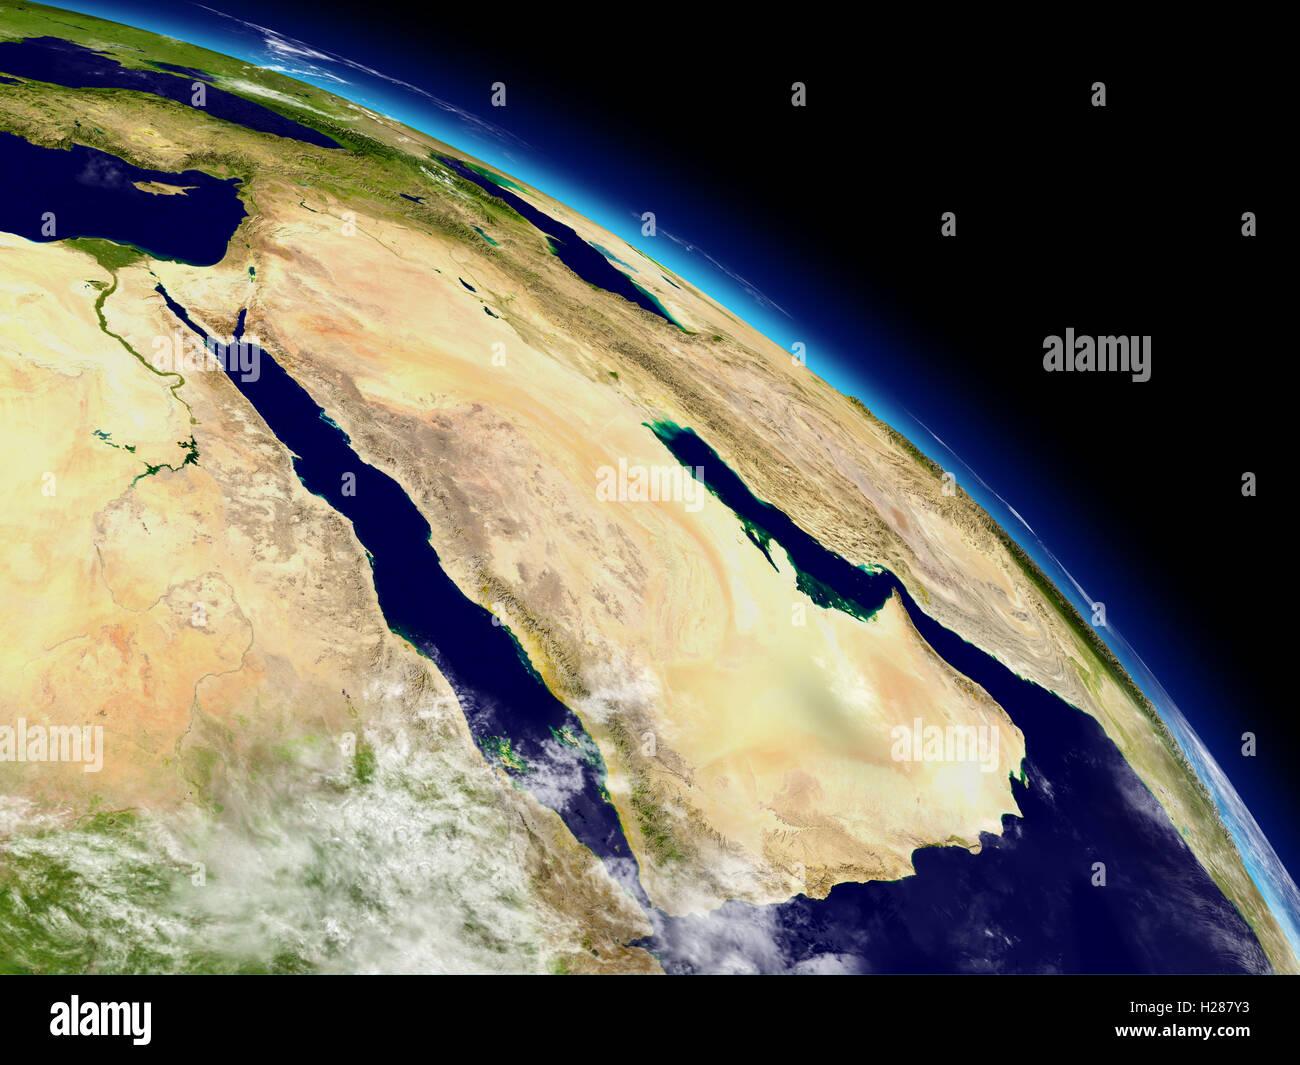 Arabian peninsula from space - Stock Image